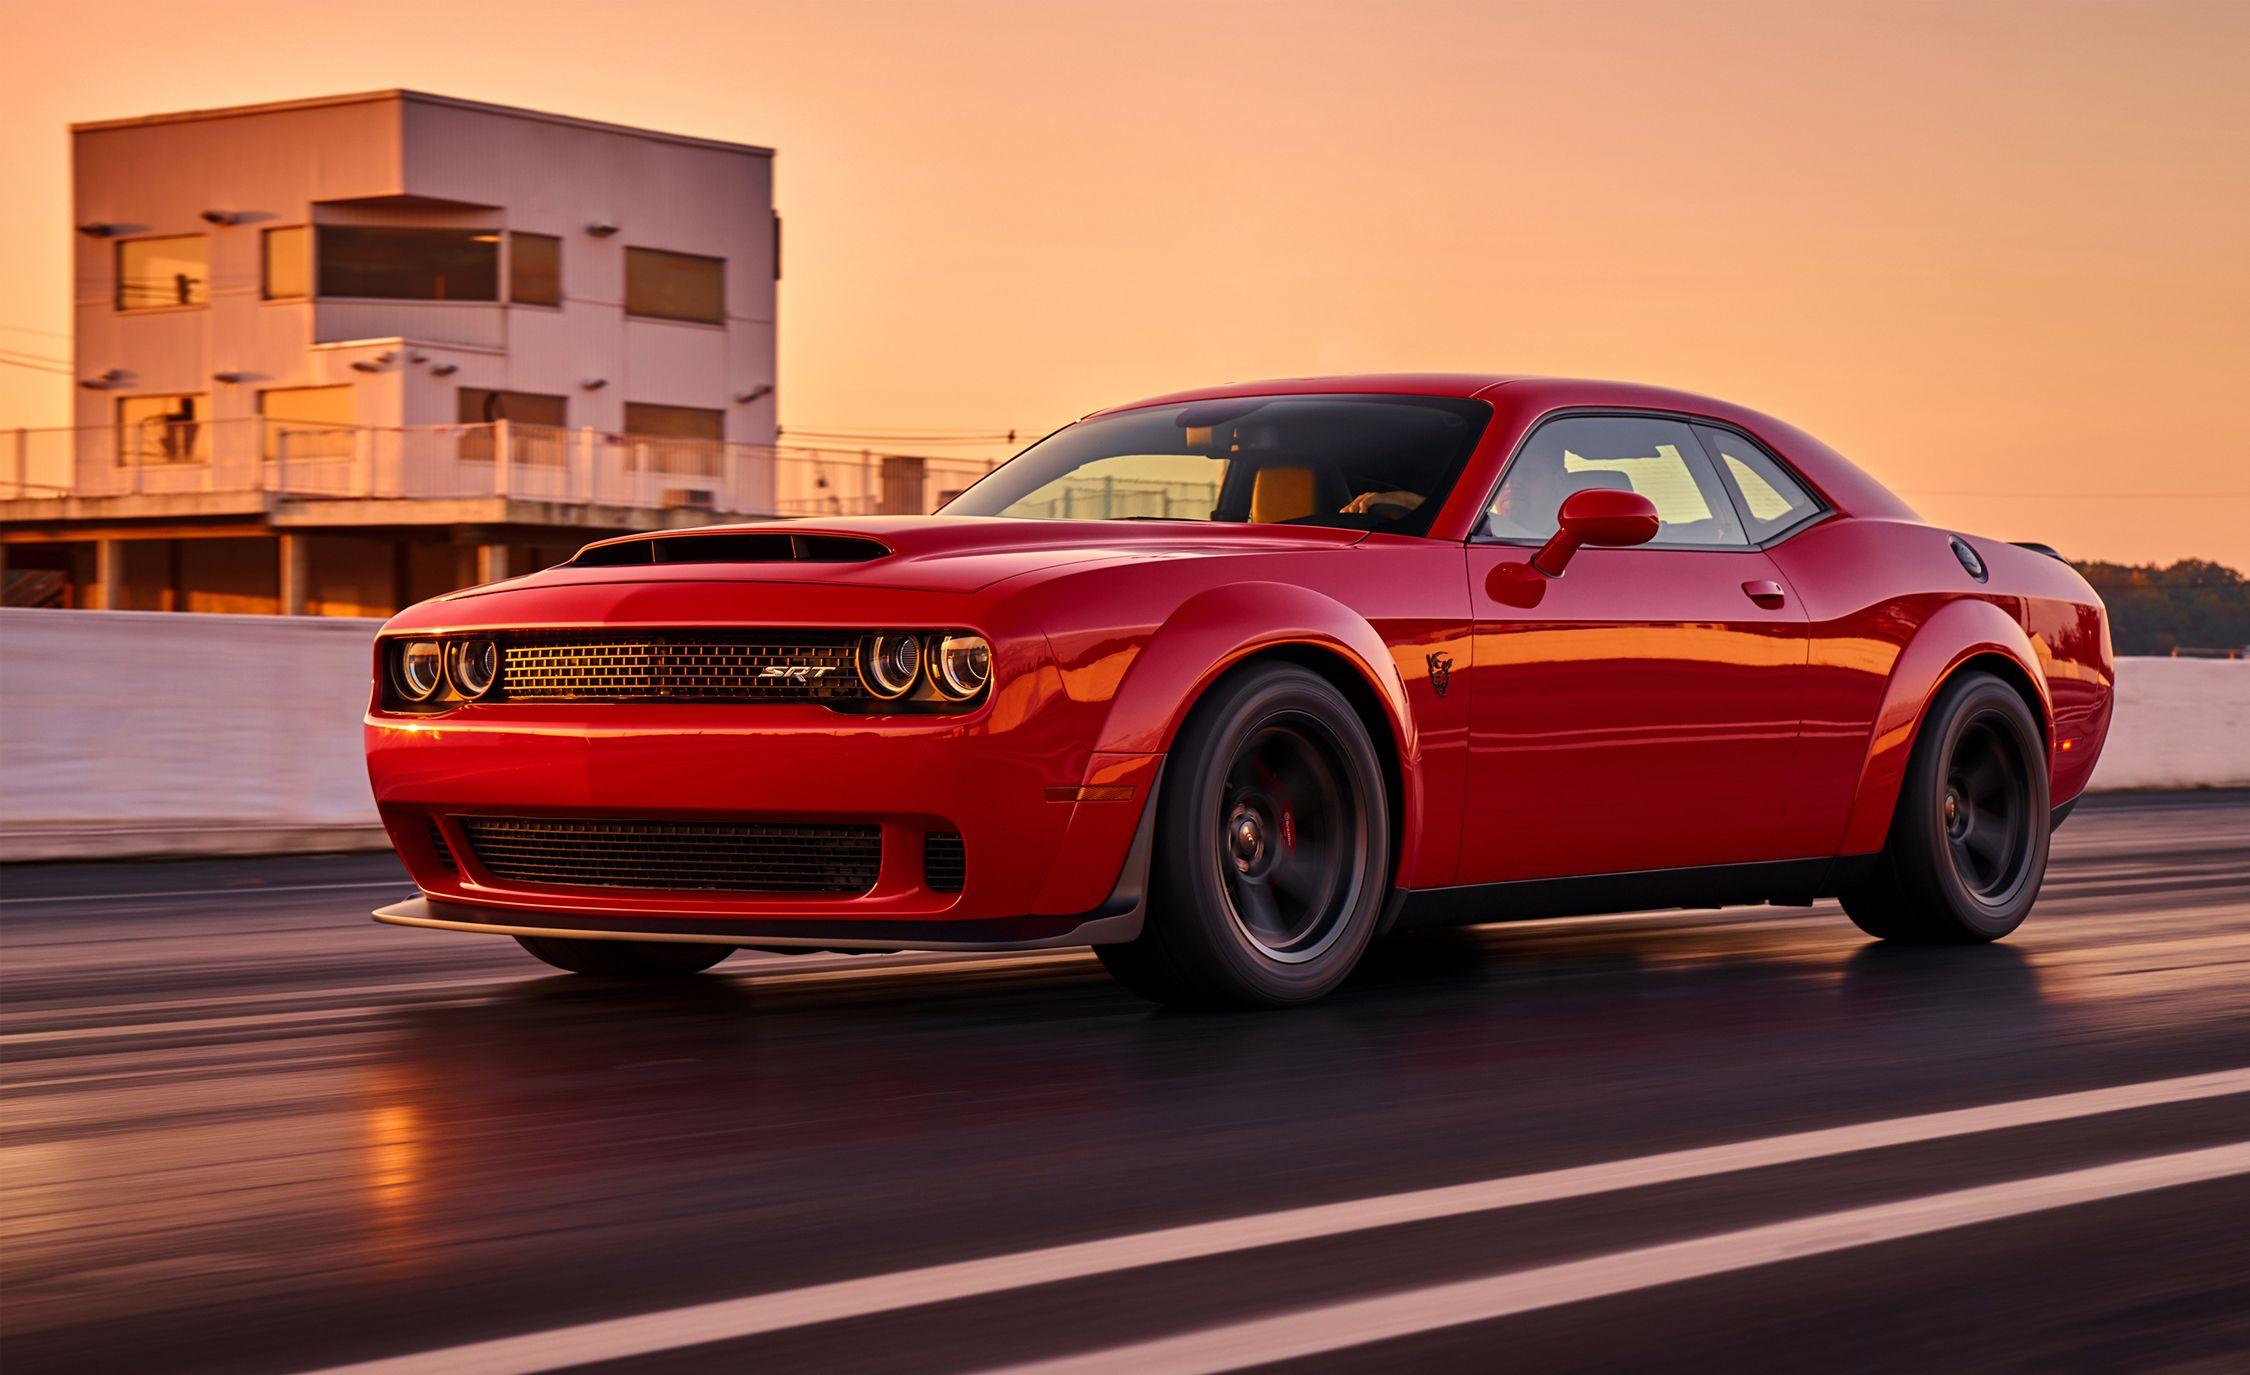 2018 Dodge Challenger Srt Demon Photos And Info